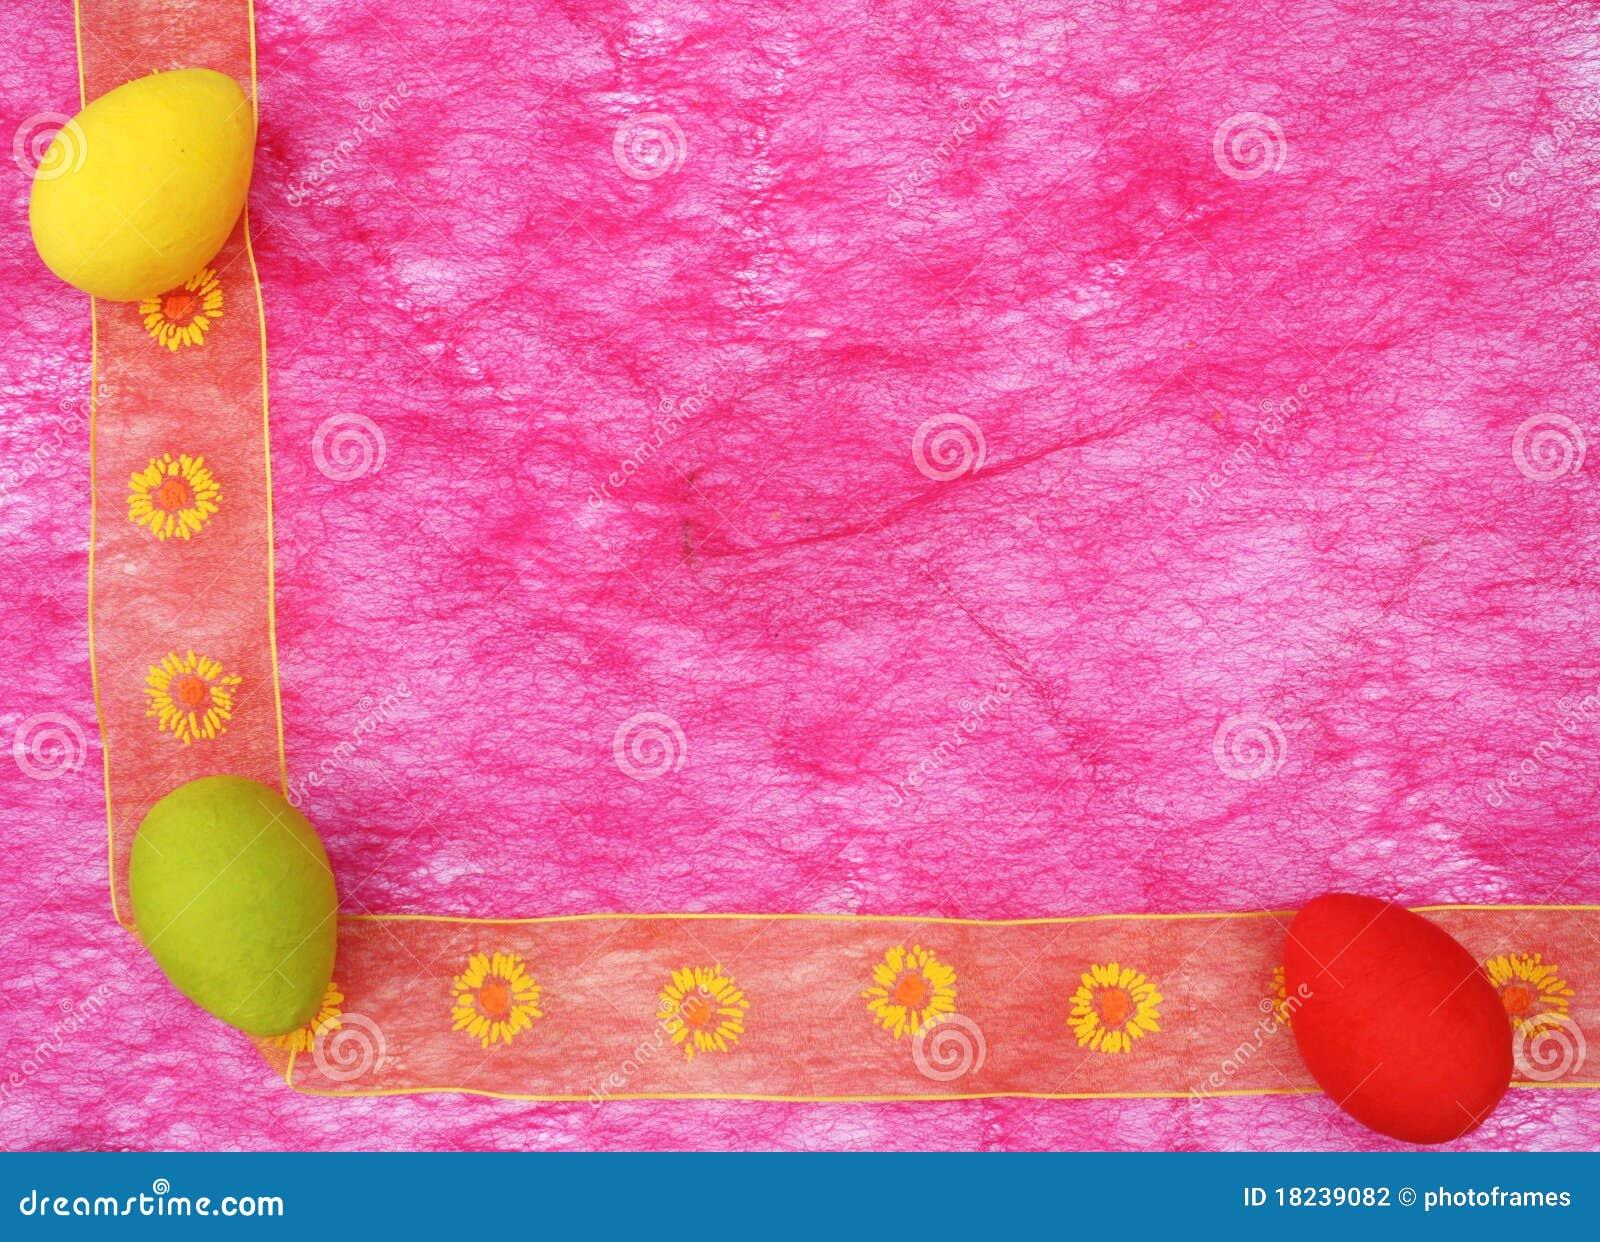 Colorful easter eggs corner boarder